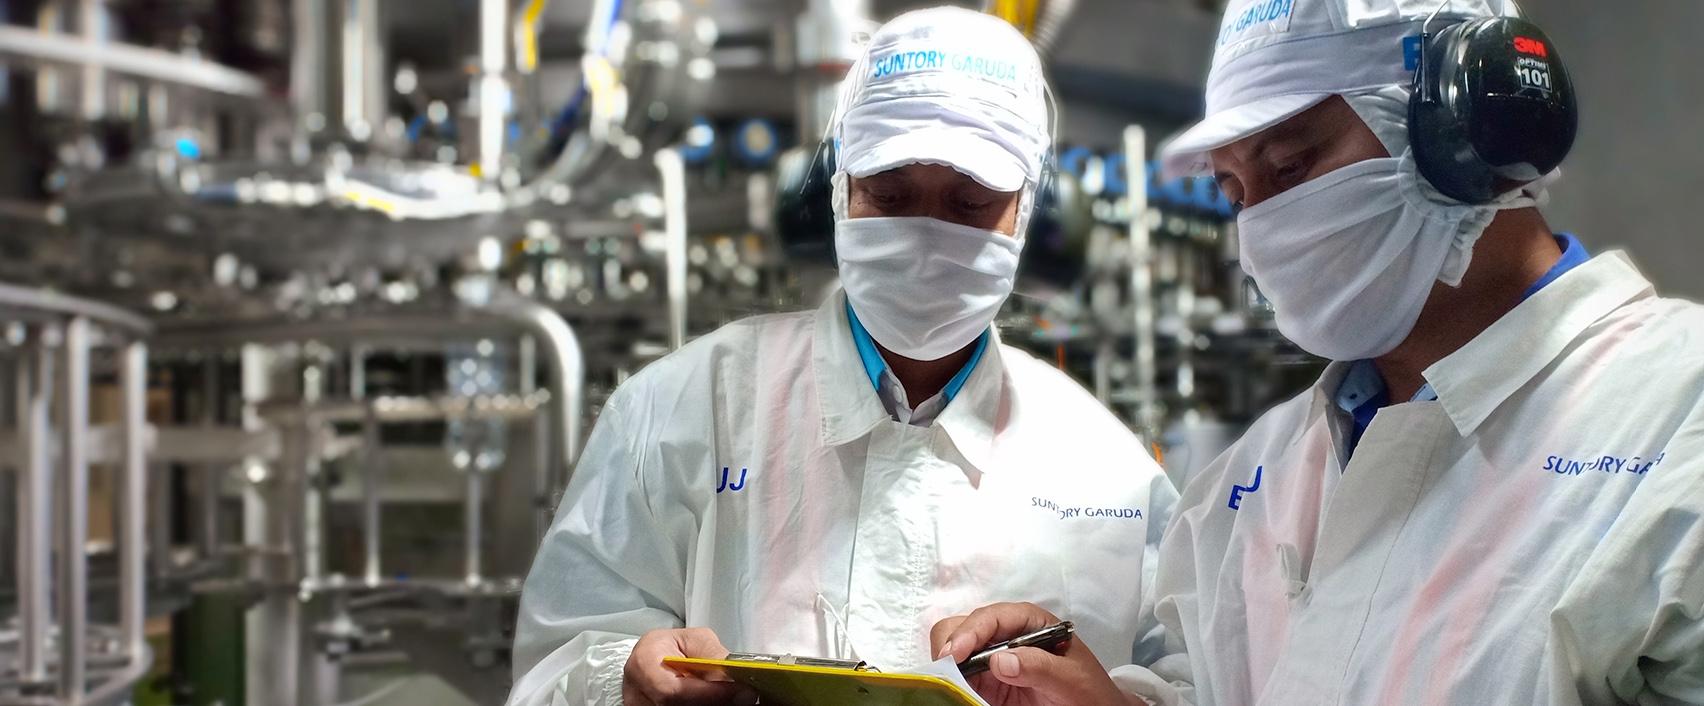 Suntory Garuda menerapkan Good Manufacturing Practices